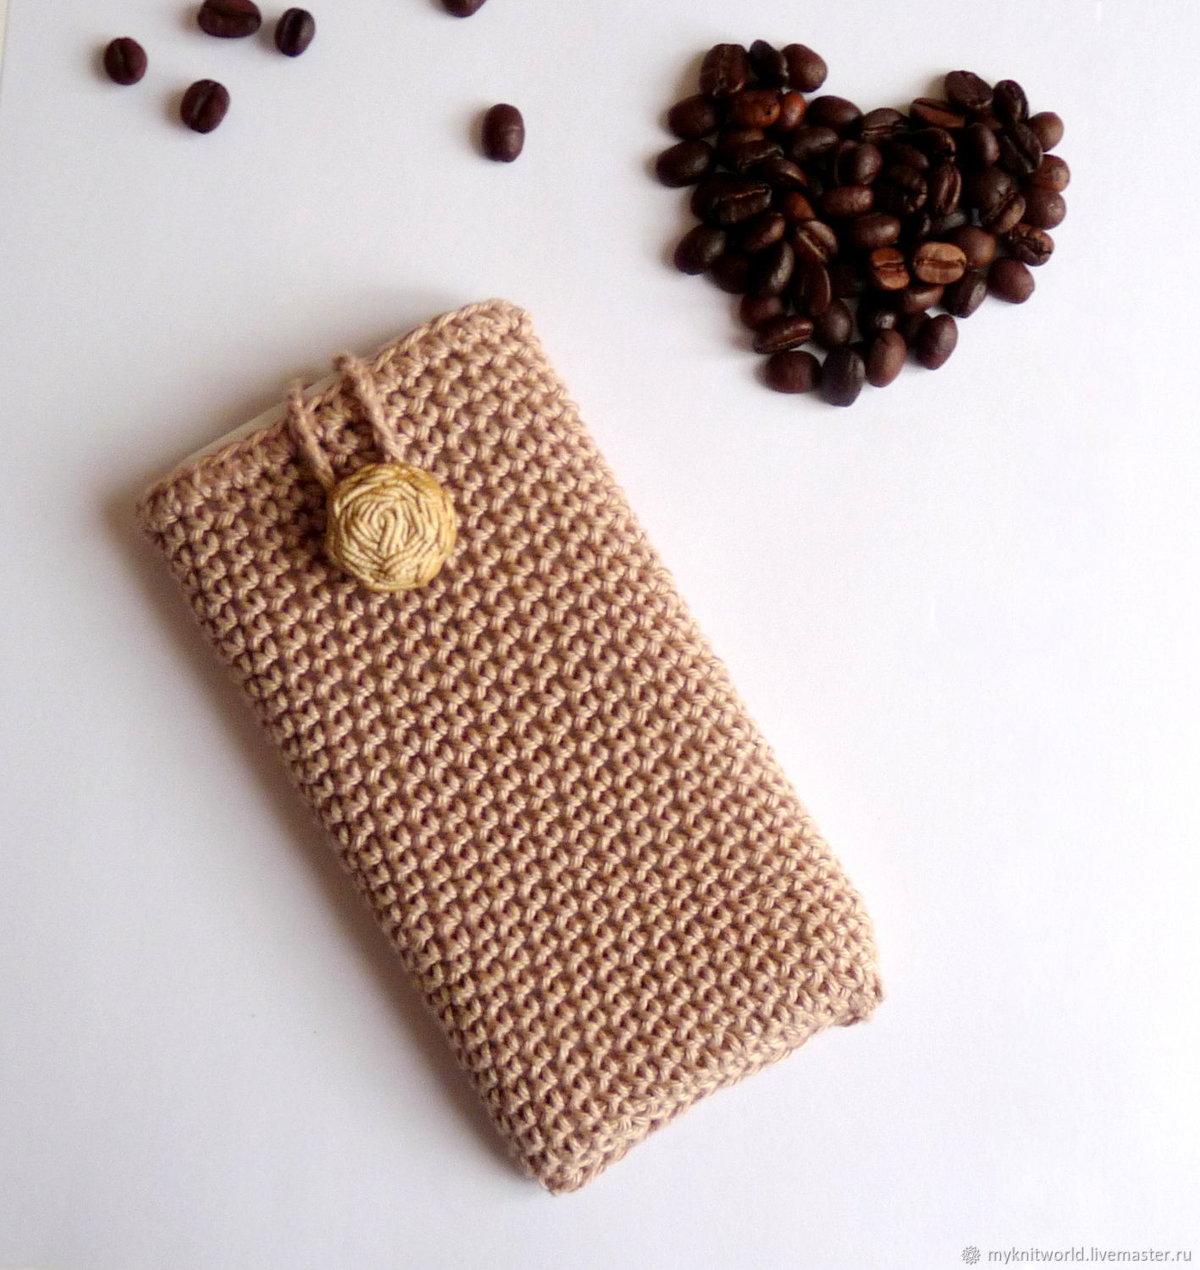 картинки вязаного чехла для телефона материал легко